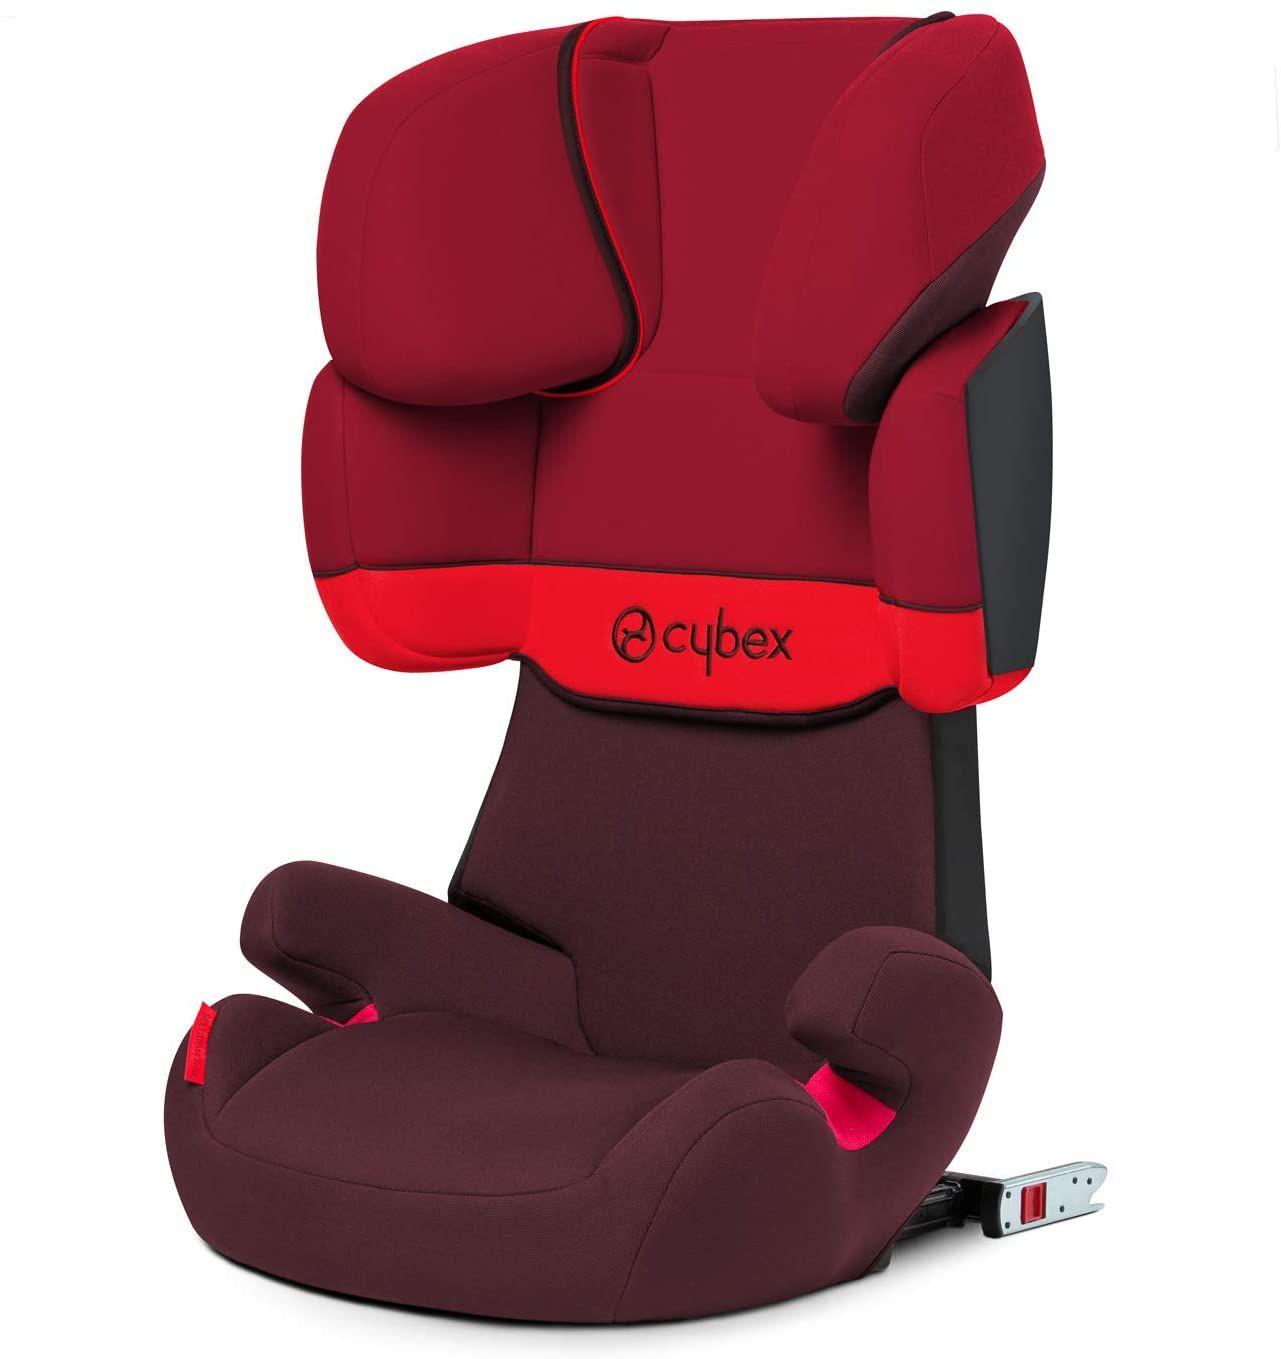 Cybex Silver Solution X-Fix Silla de Coche Grupo 2/3 (15-36 kg), desde aprox 3 hasta 12 Años, Rojo (Rumba Red),